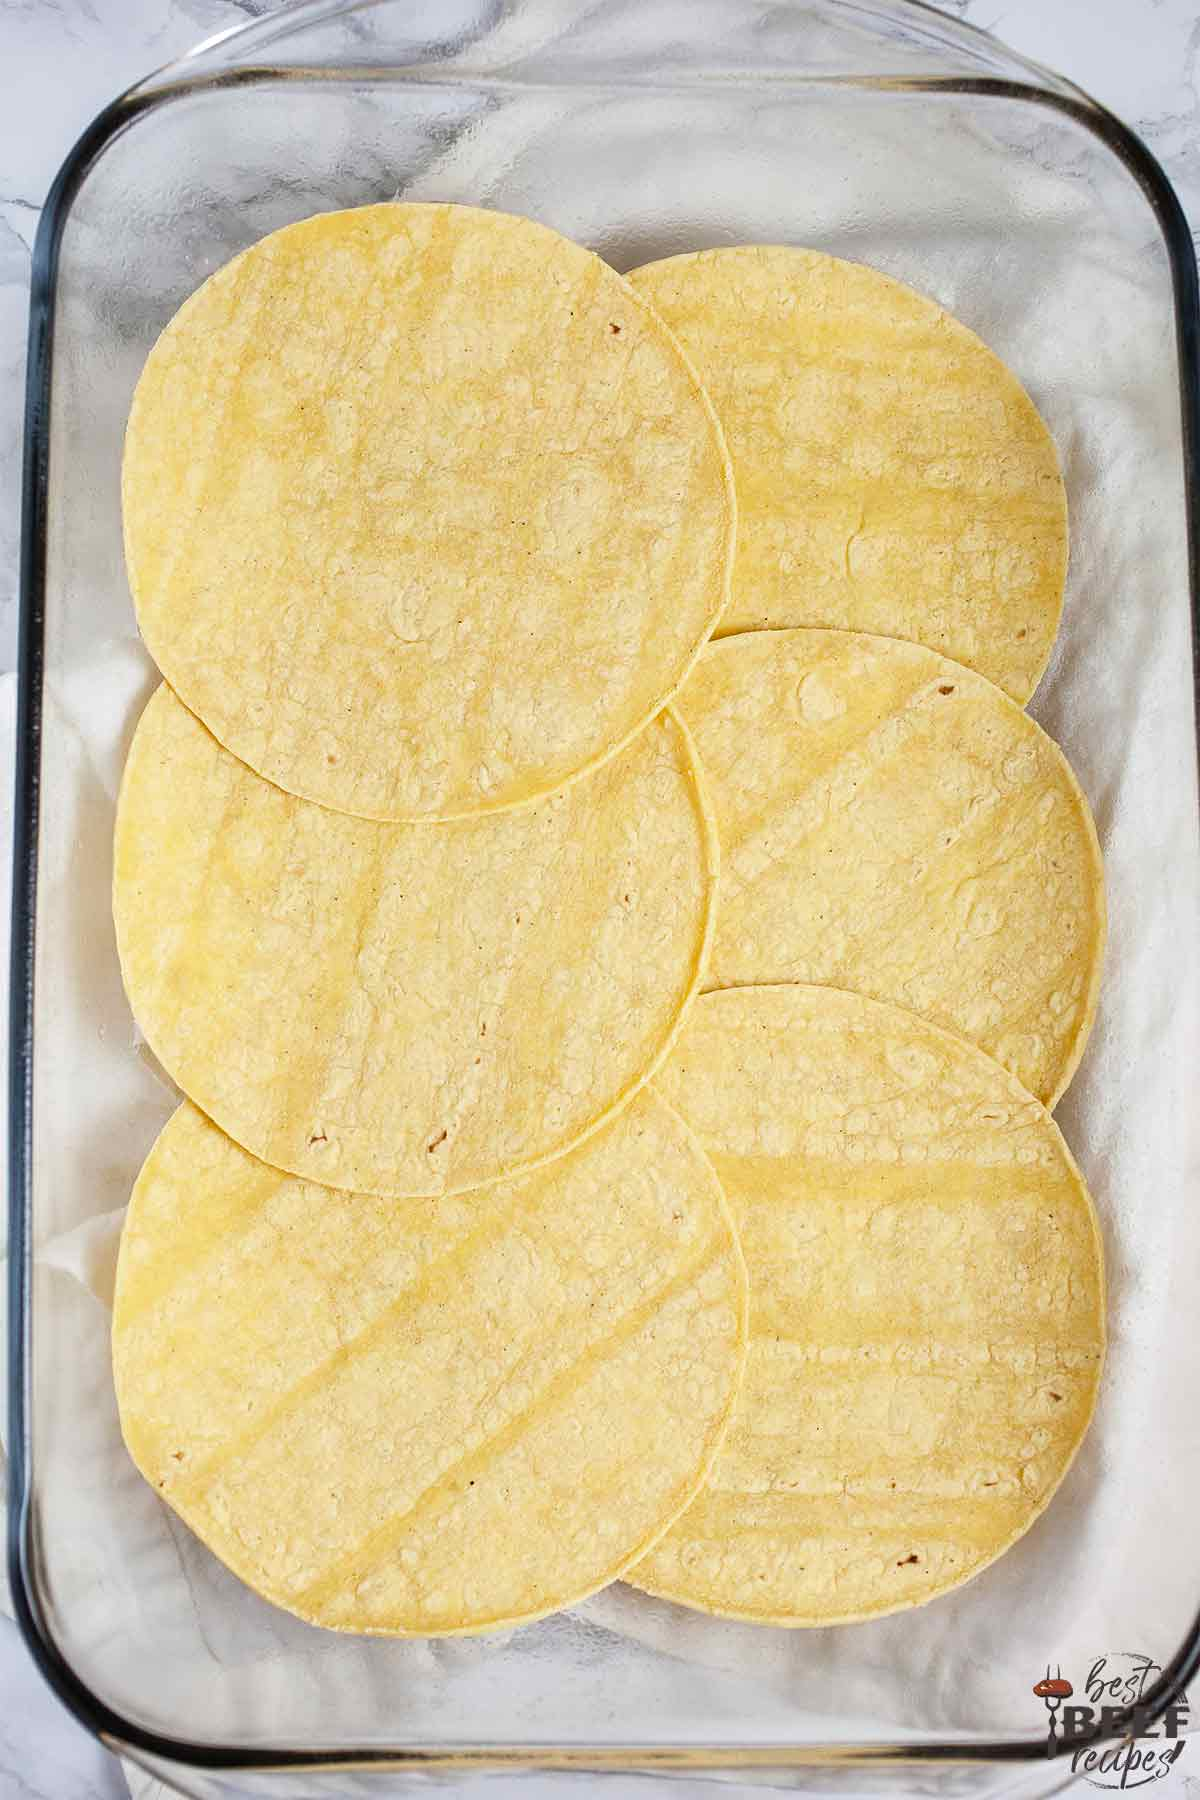 Layering corn tortillas in a glass dish